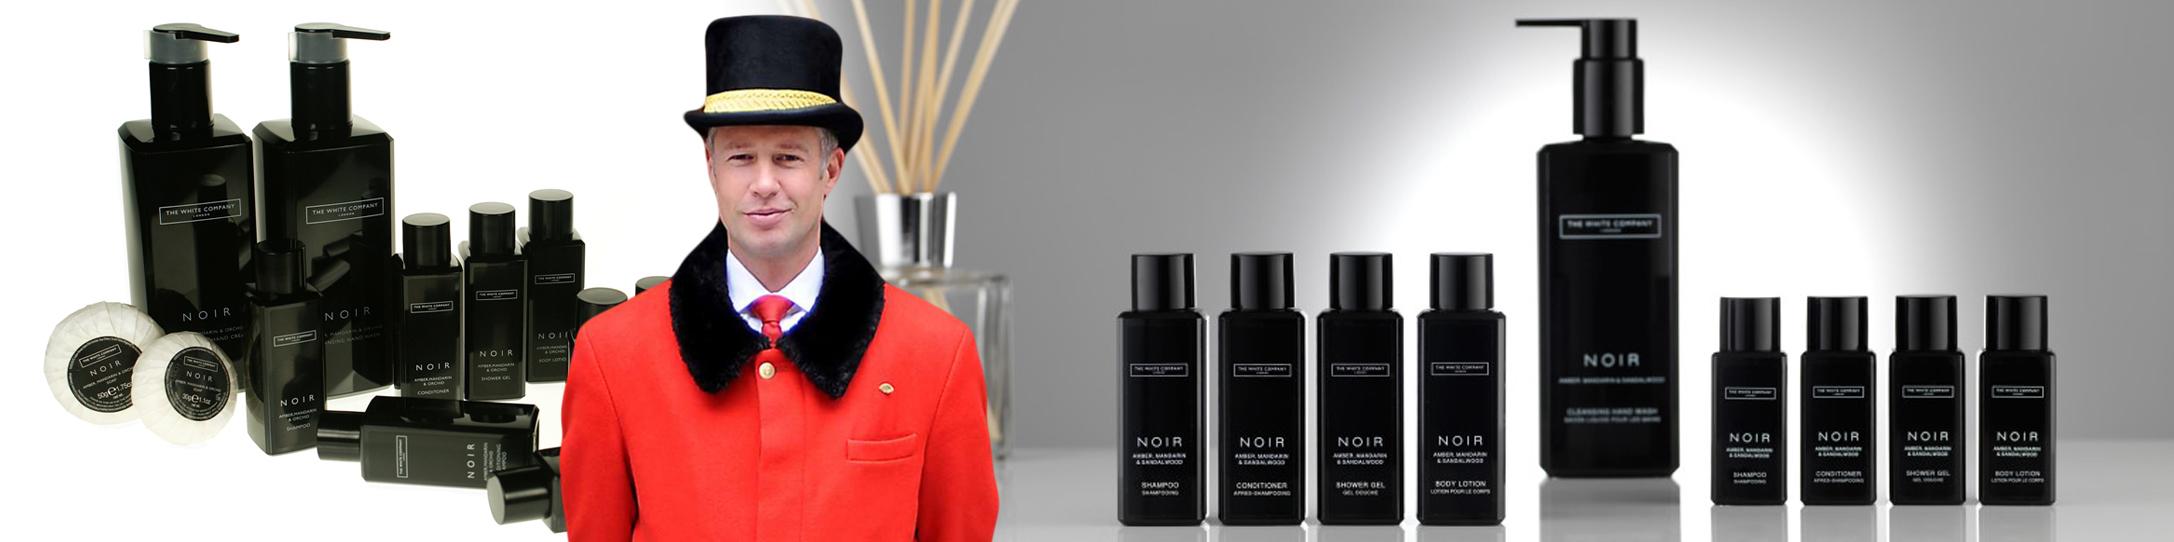 Жидкое мыло The White Company Noir, 300 мл